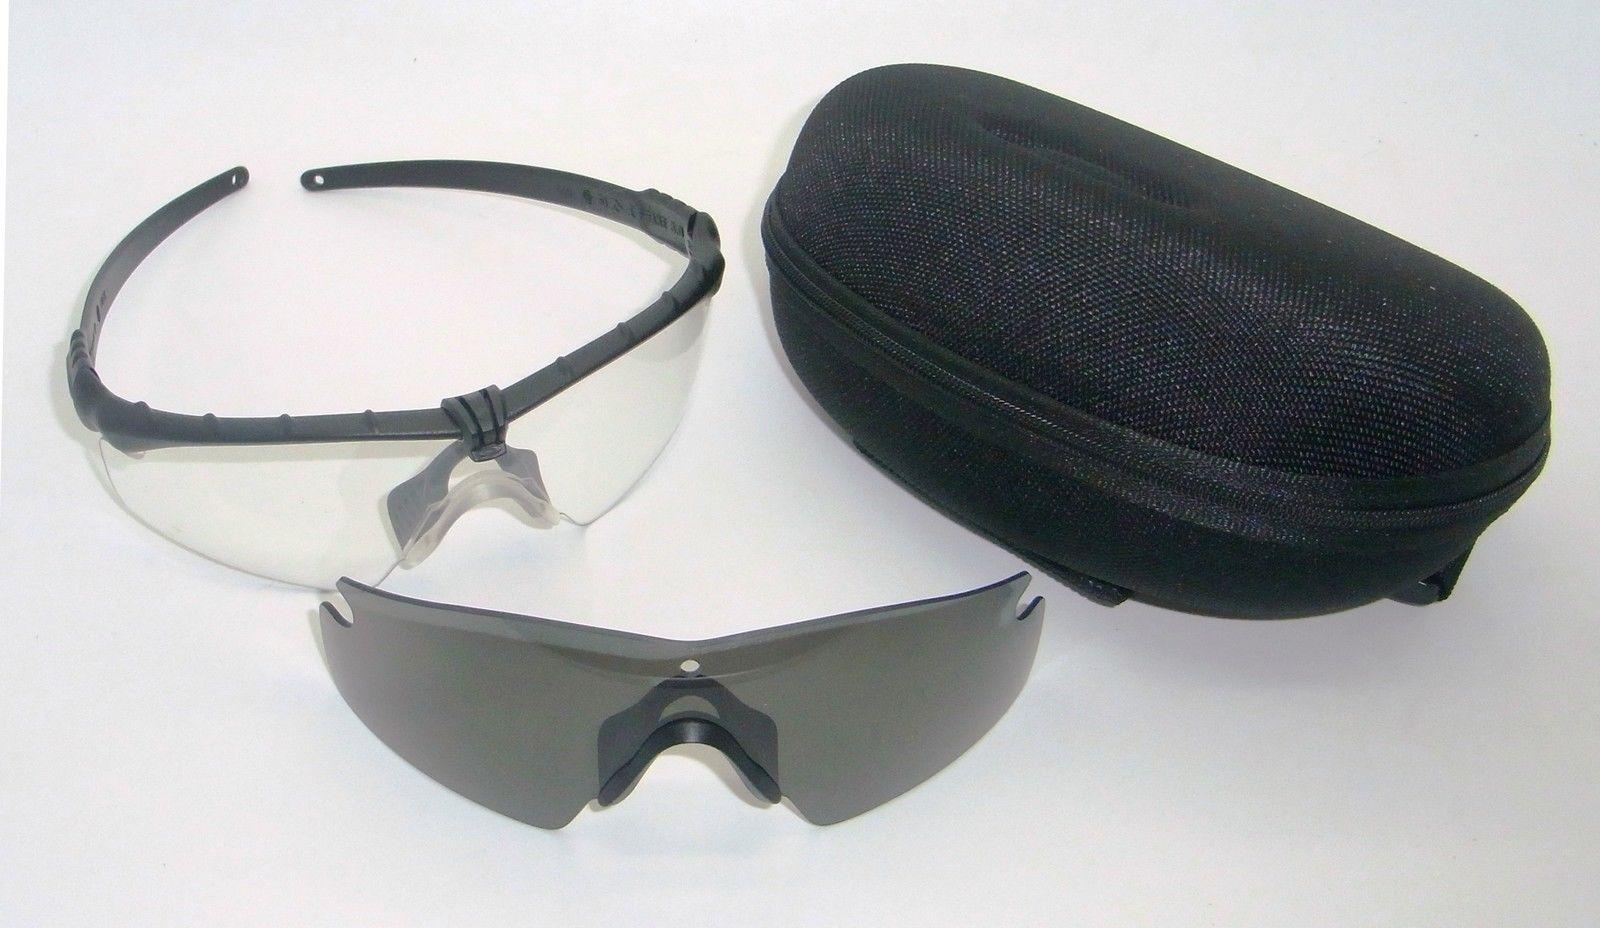 Oculos Oakley M Frame Strike Preço | Louisiana Bucket Brigade